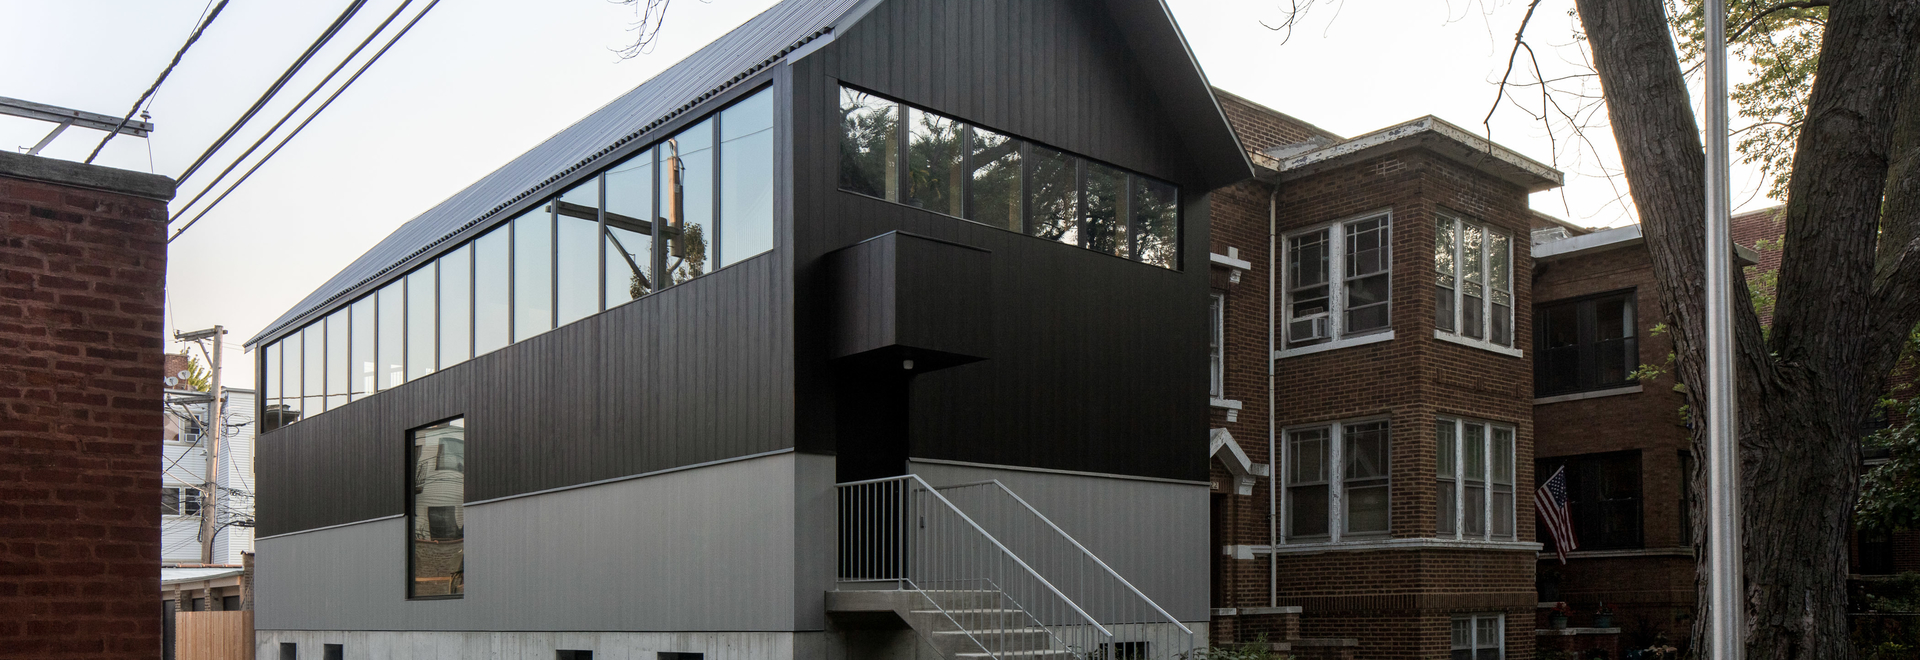 Maison Ardmore